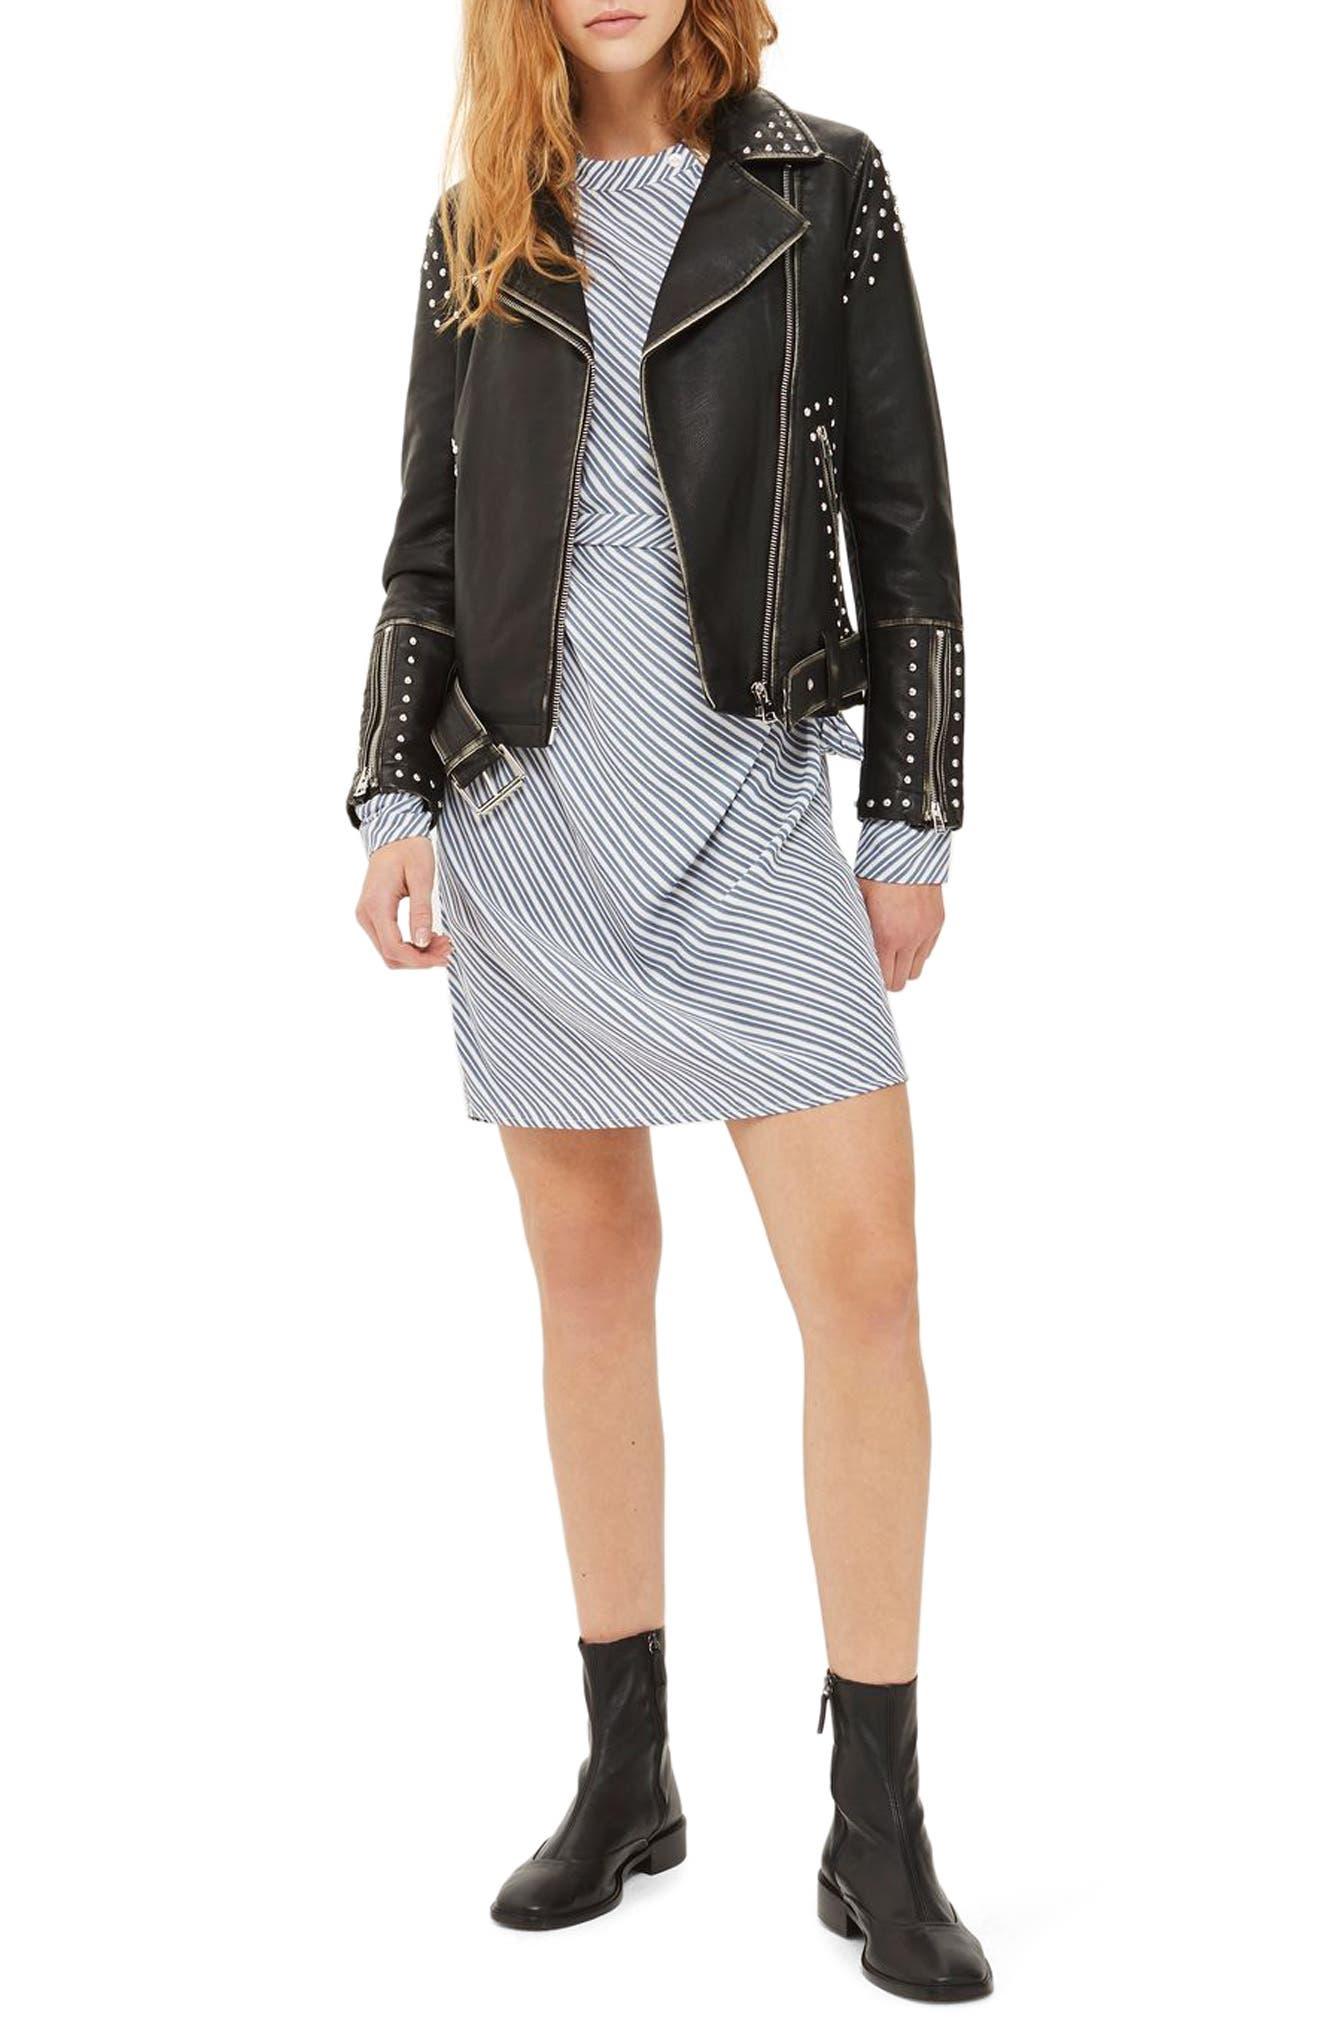 Naomi Studded Faux Leather Biker Jacket,                             Main thumbnail 1, color,                             001